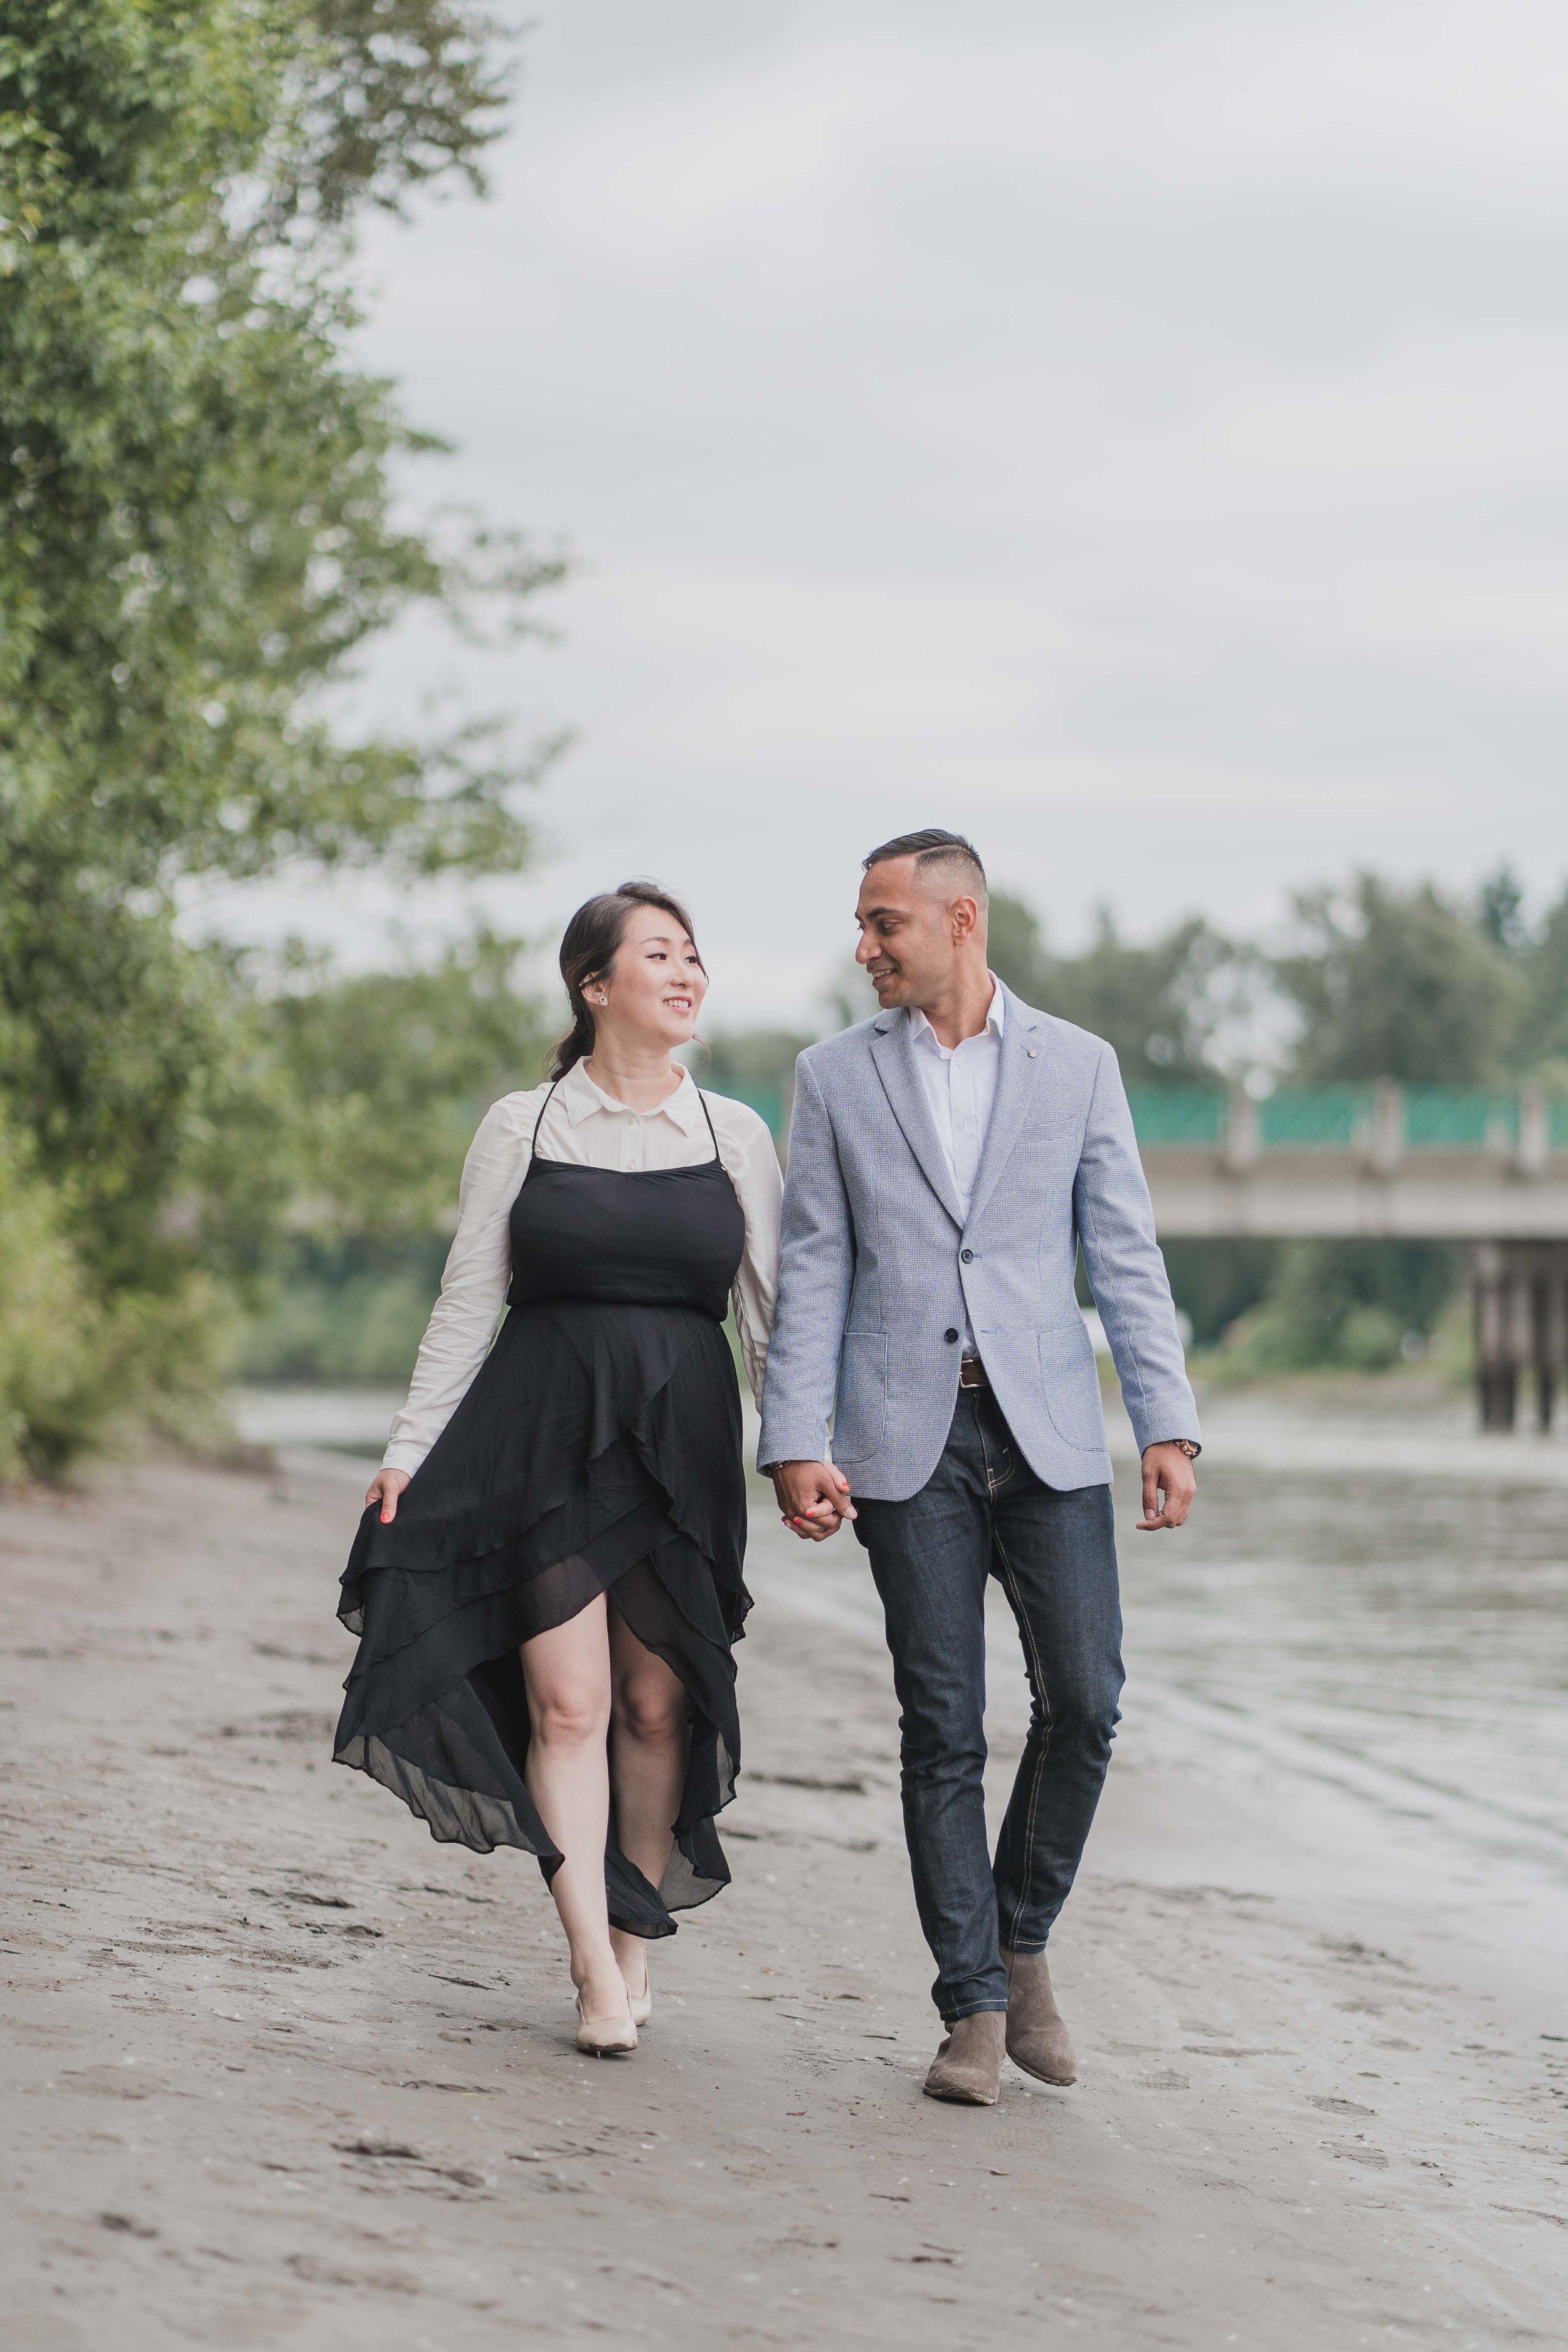 20190622 - Monika & Johnson Engagement - 0126.jpg